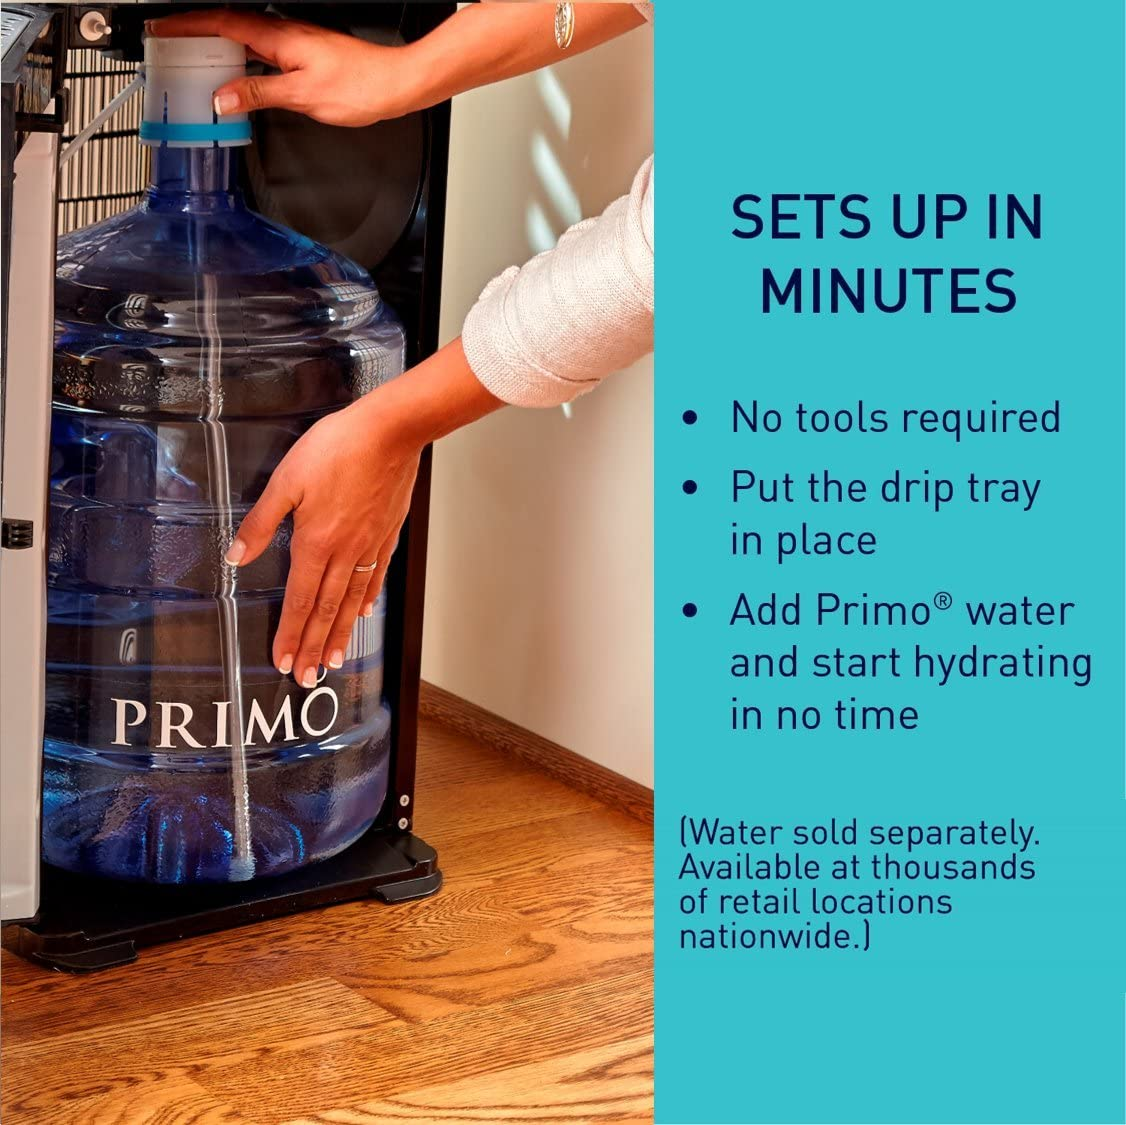 Primo Self-Sanitizing Bottom Load Water Cooler Dispenser - Setup in minutes